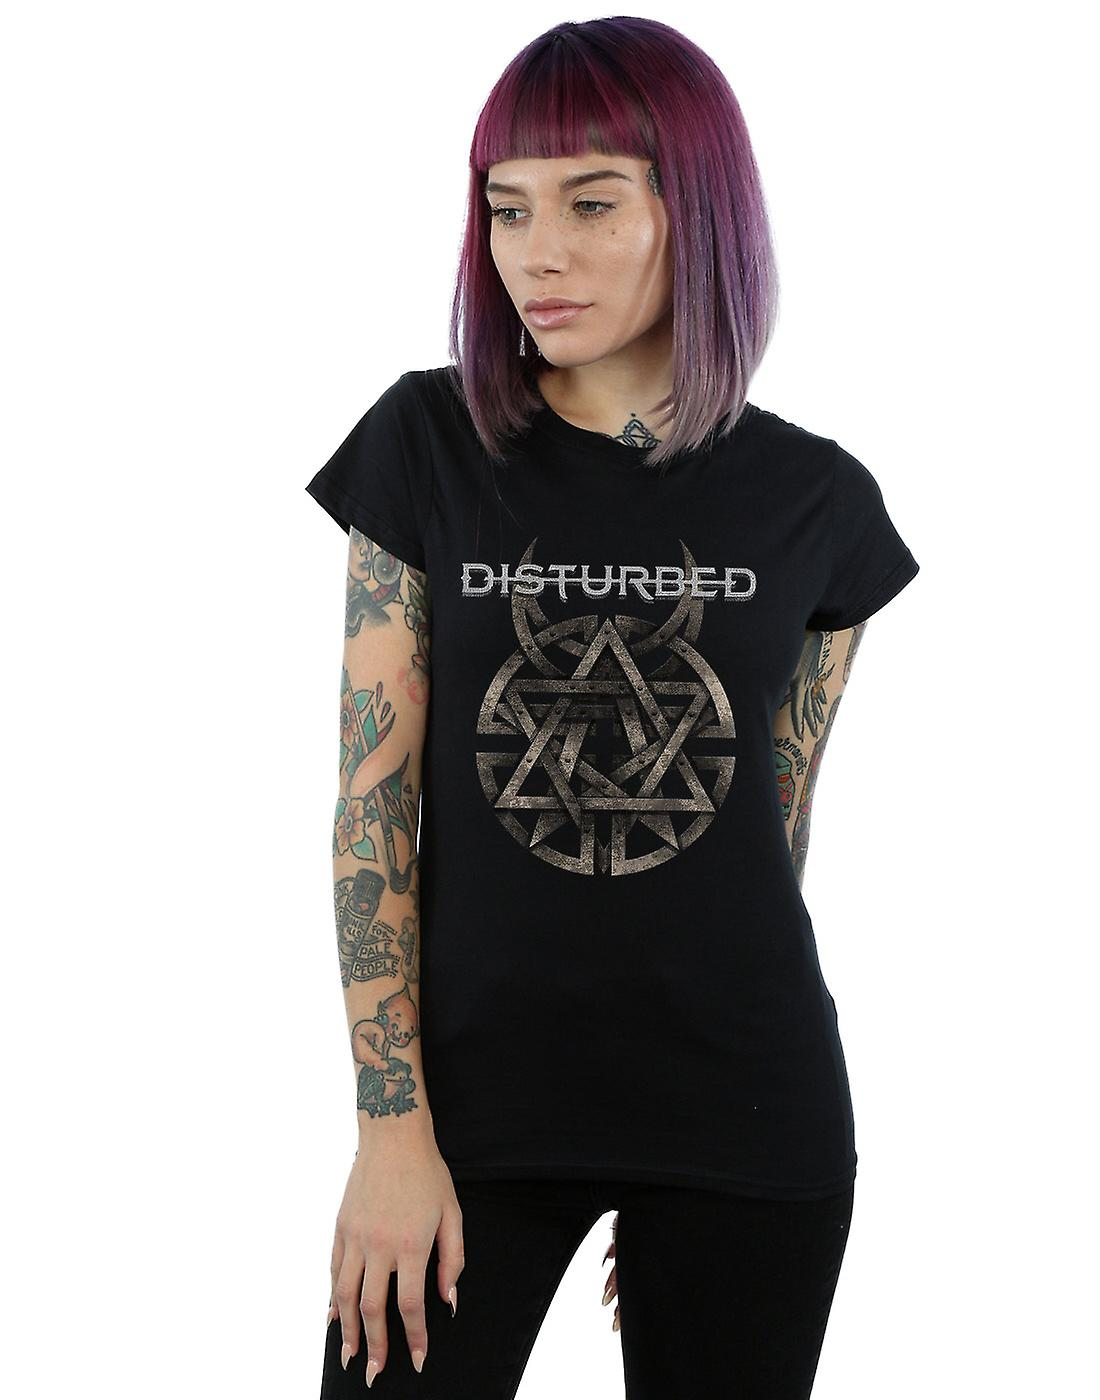 Disturbed Women's Metal Logo T-Shirt